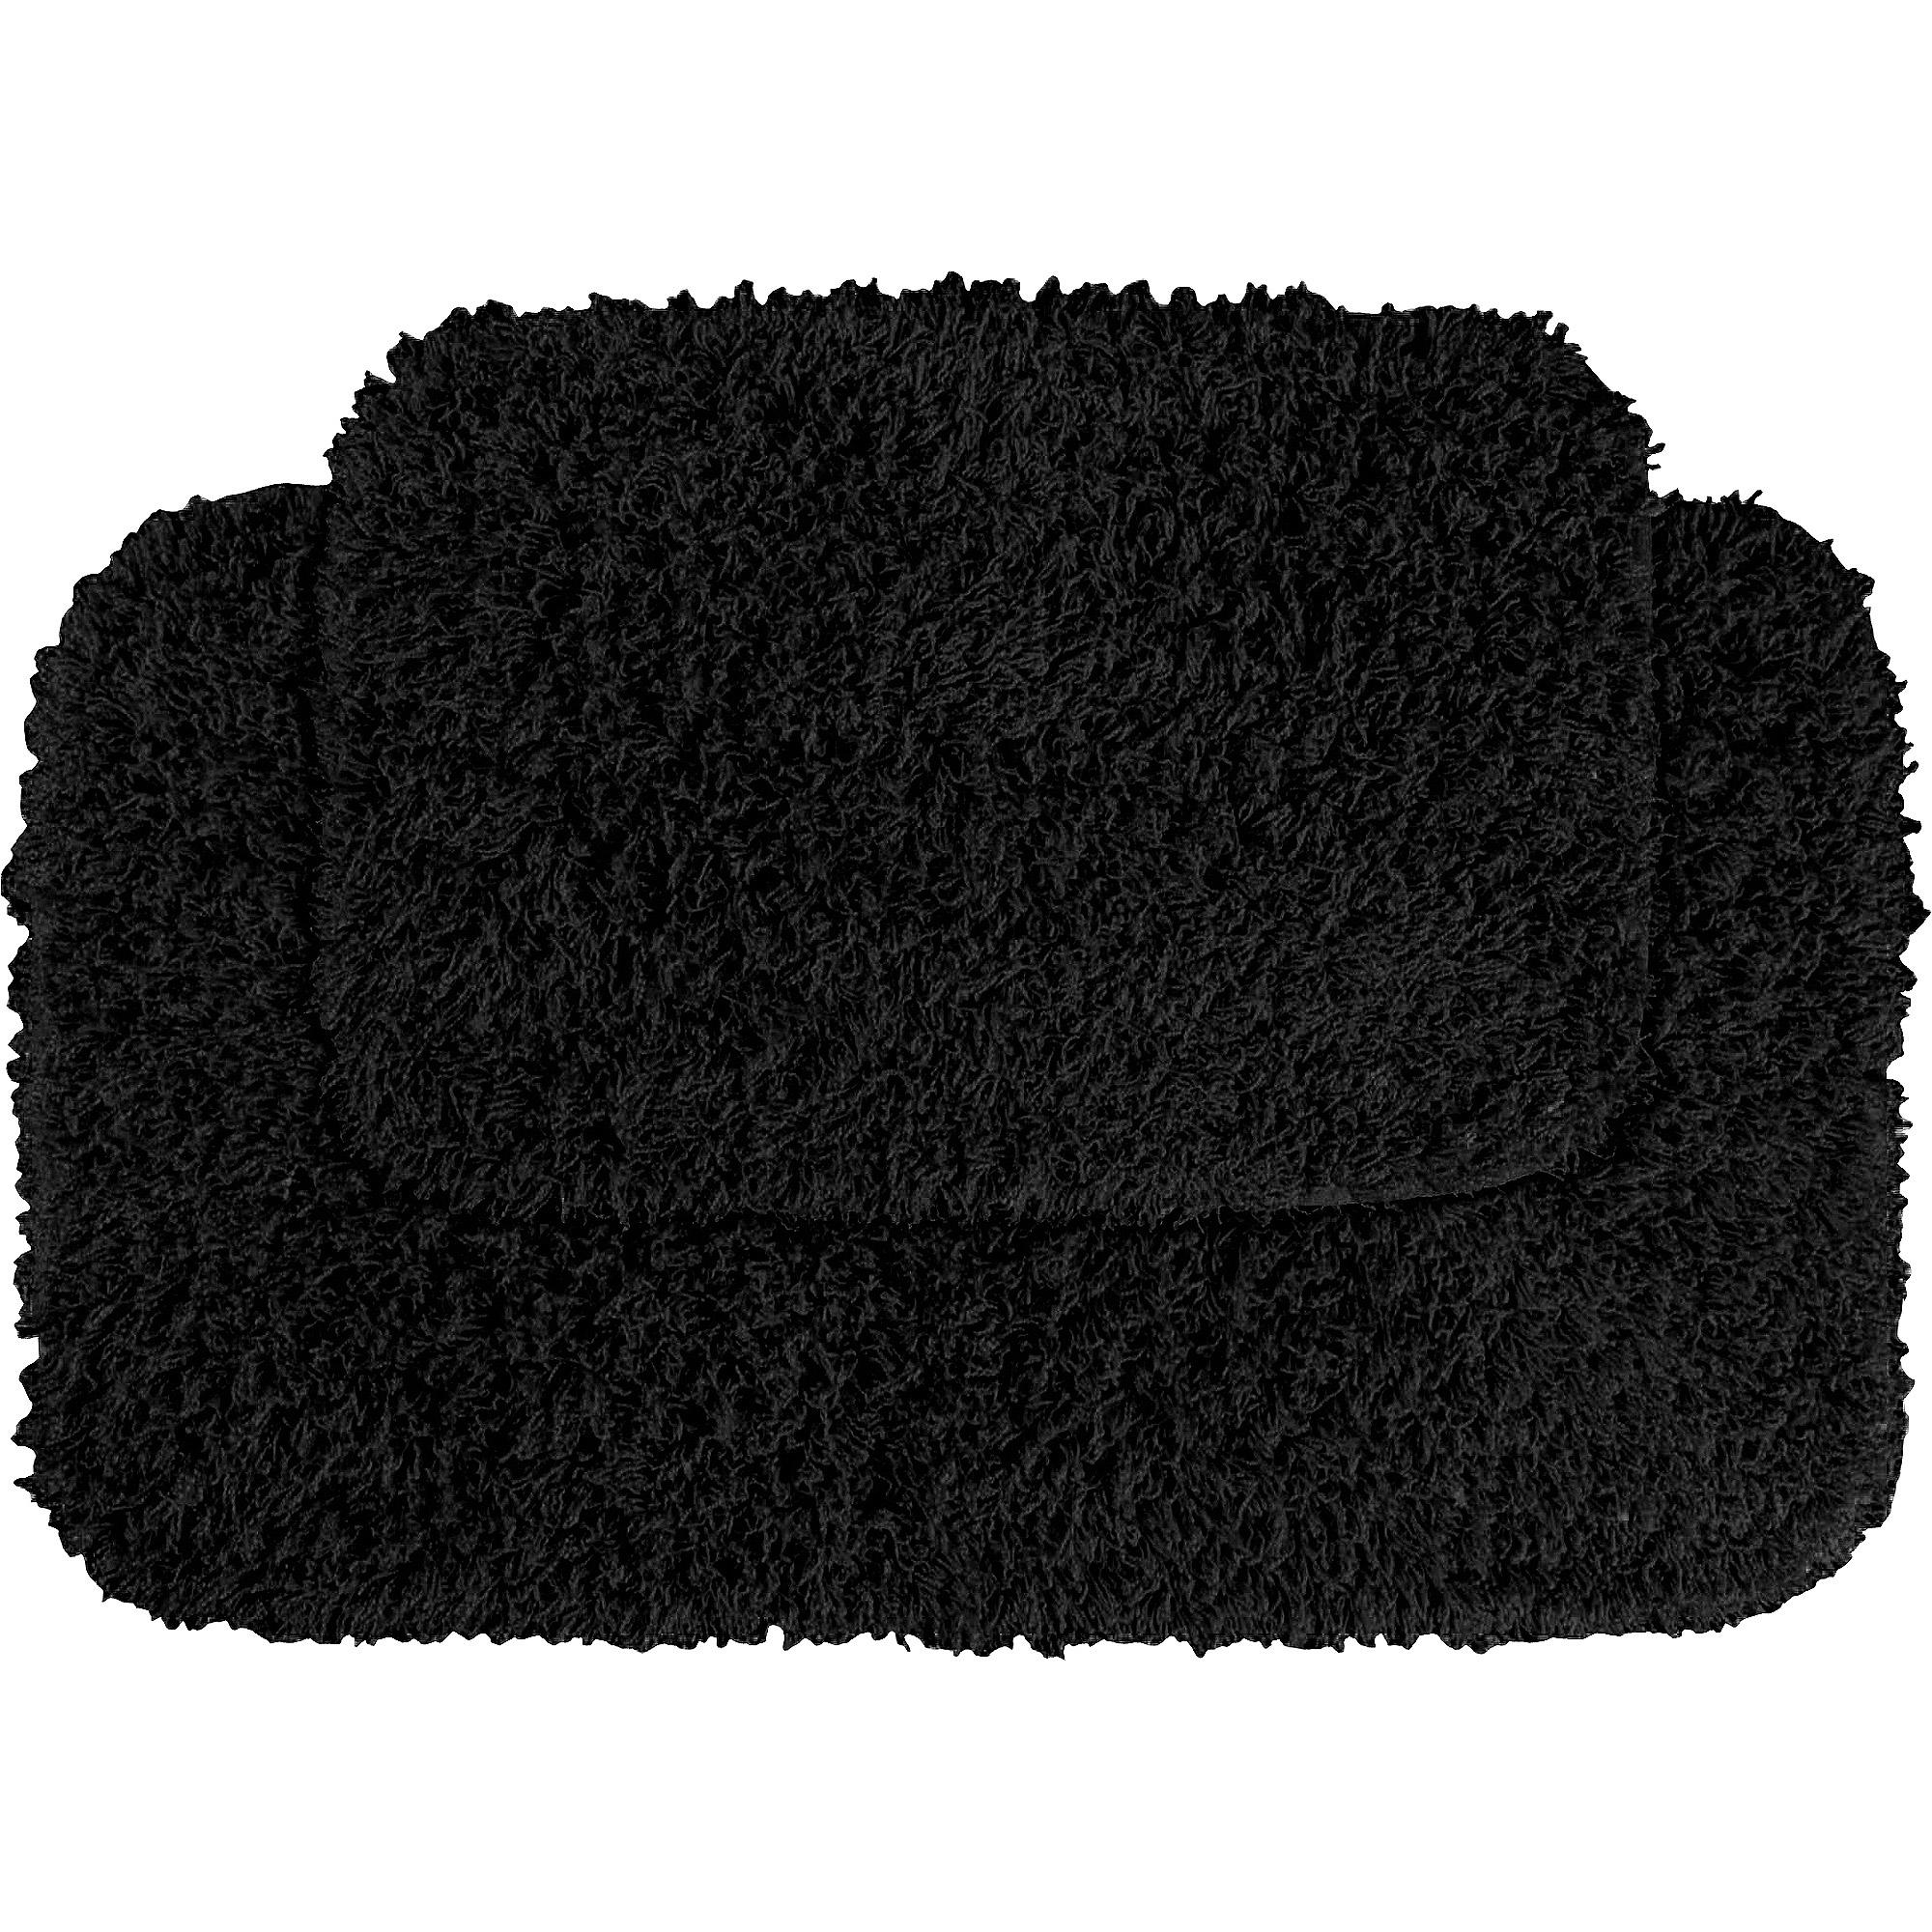 bathroom rug sets garland fiesta 2pc shag bath rug set - walmart.com UHLPCQD